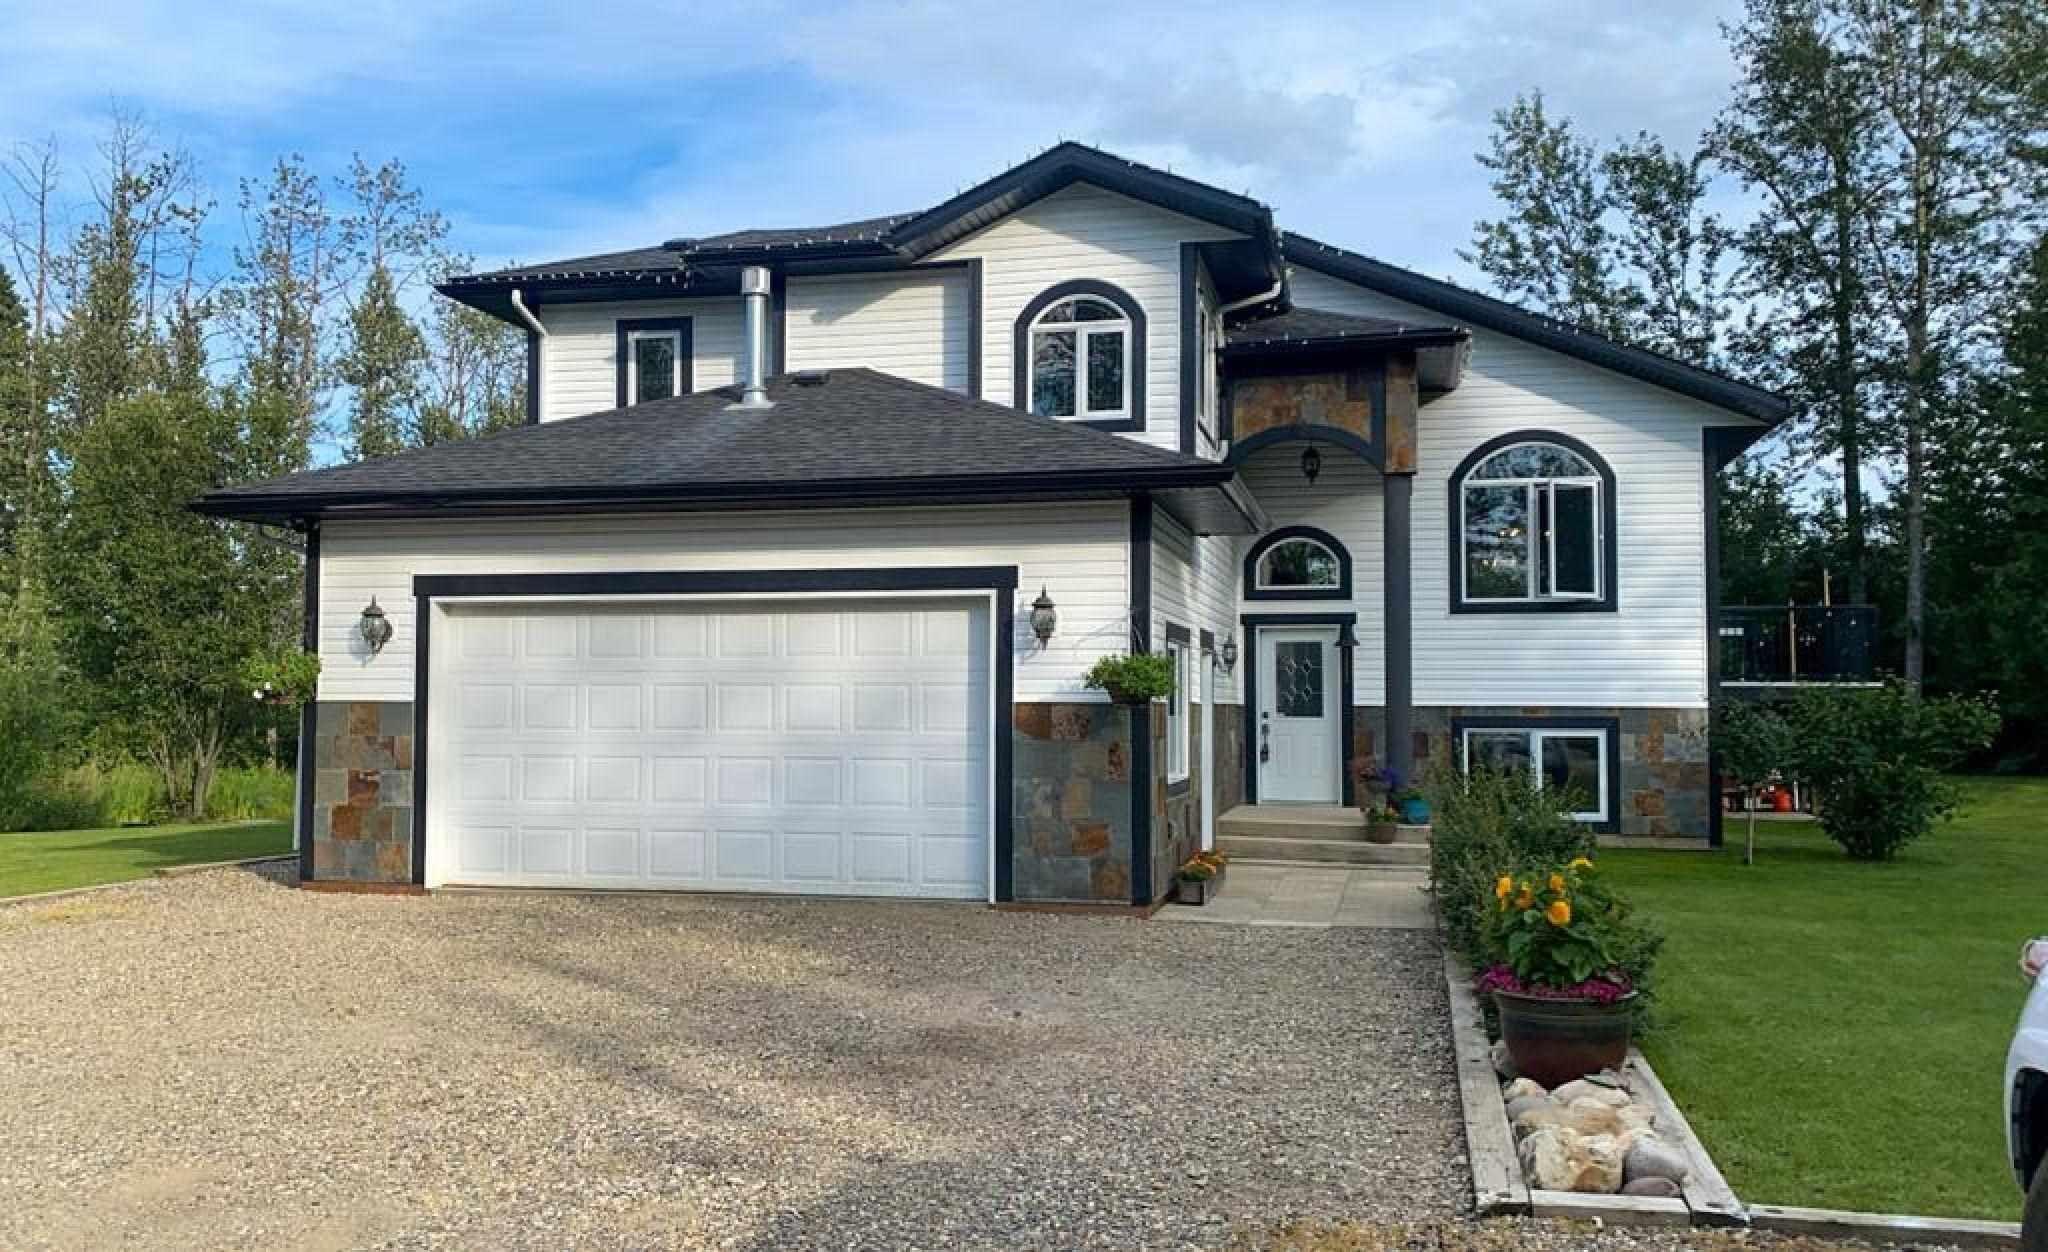 Main Photo: 13437 281 Road: Charlie Lake House for sale (Fort St. John (Zone 60))  : MLS®# R2605317